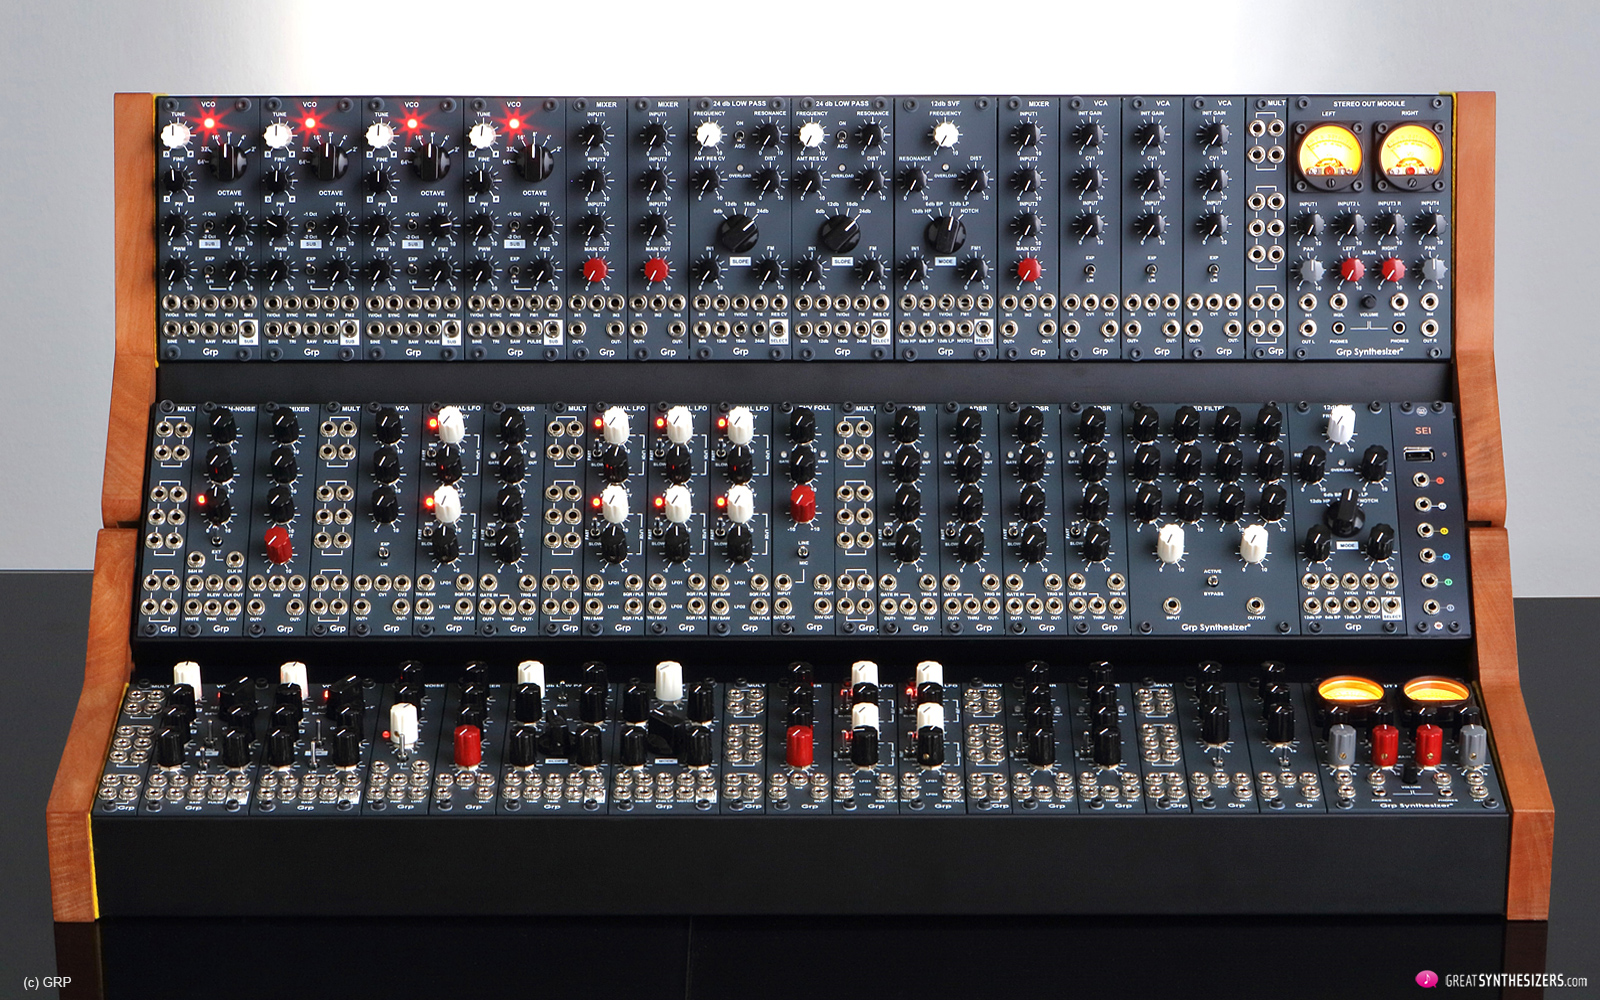 GRP Eurorack Synthesizer Modules - Modular Synthesizer